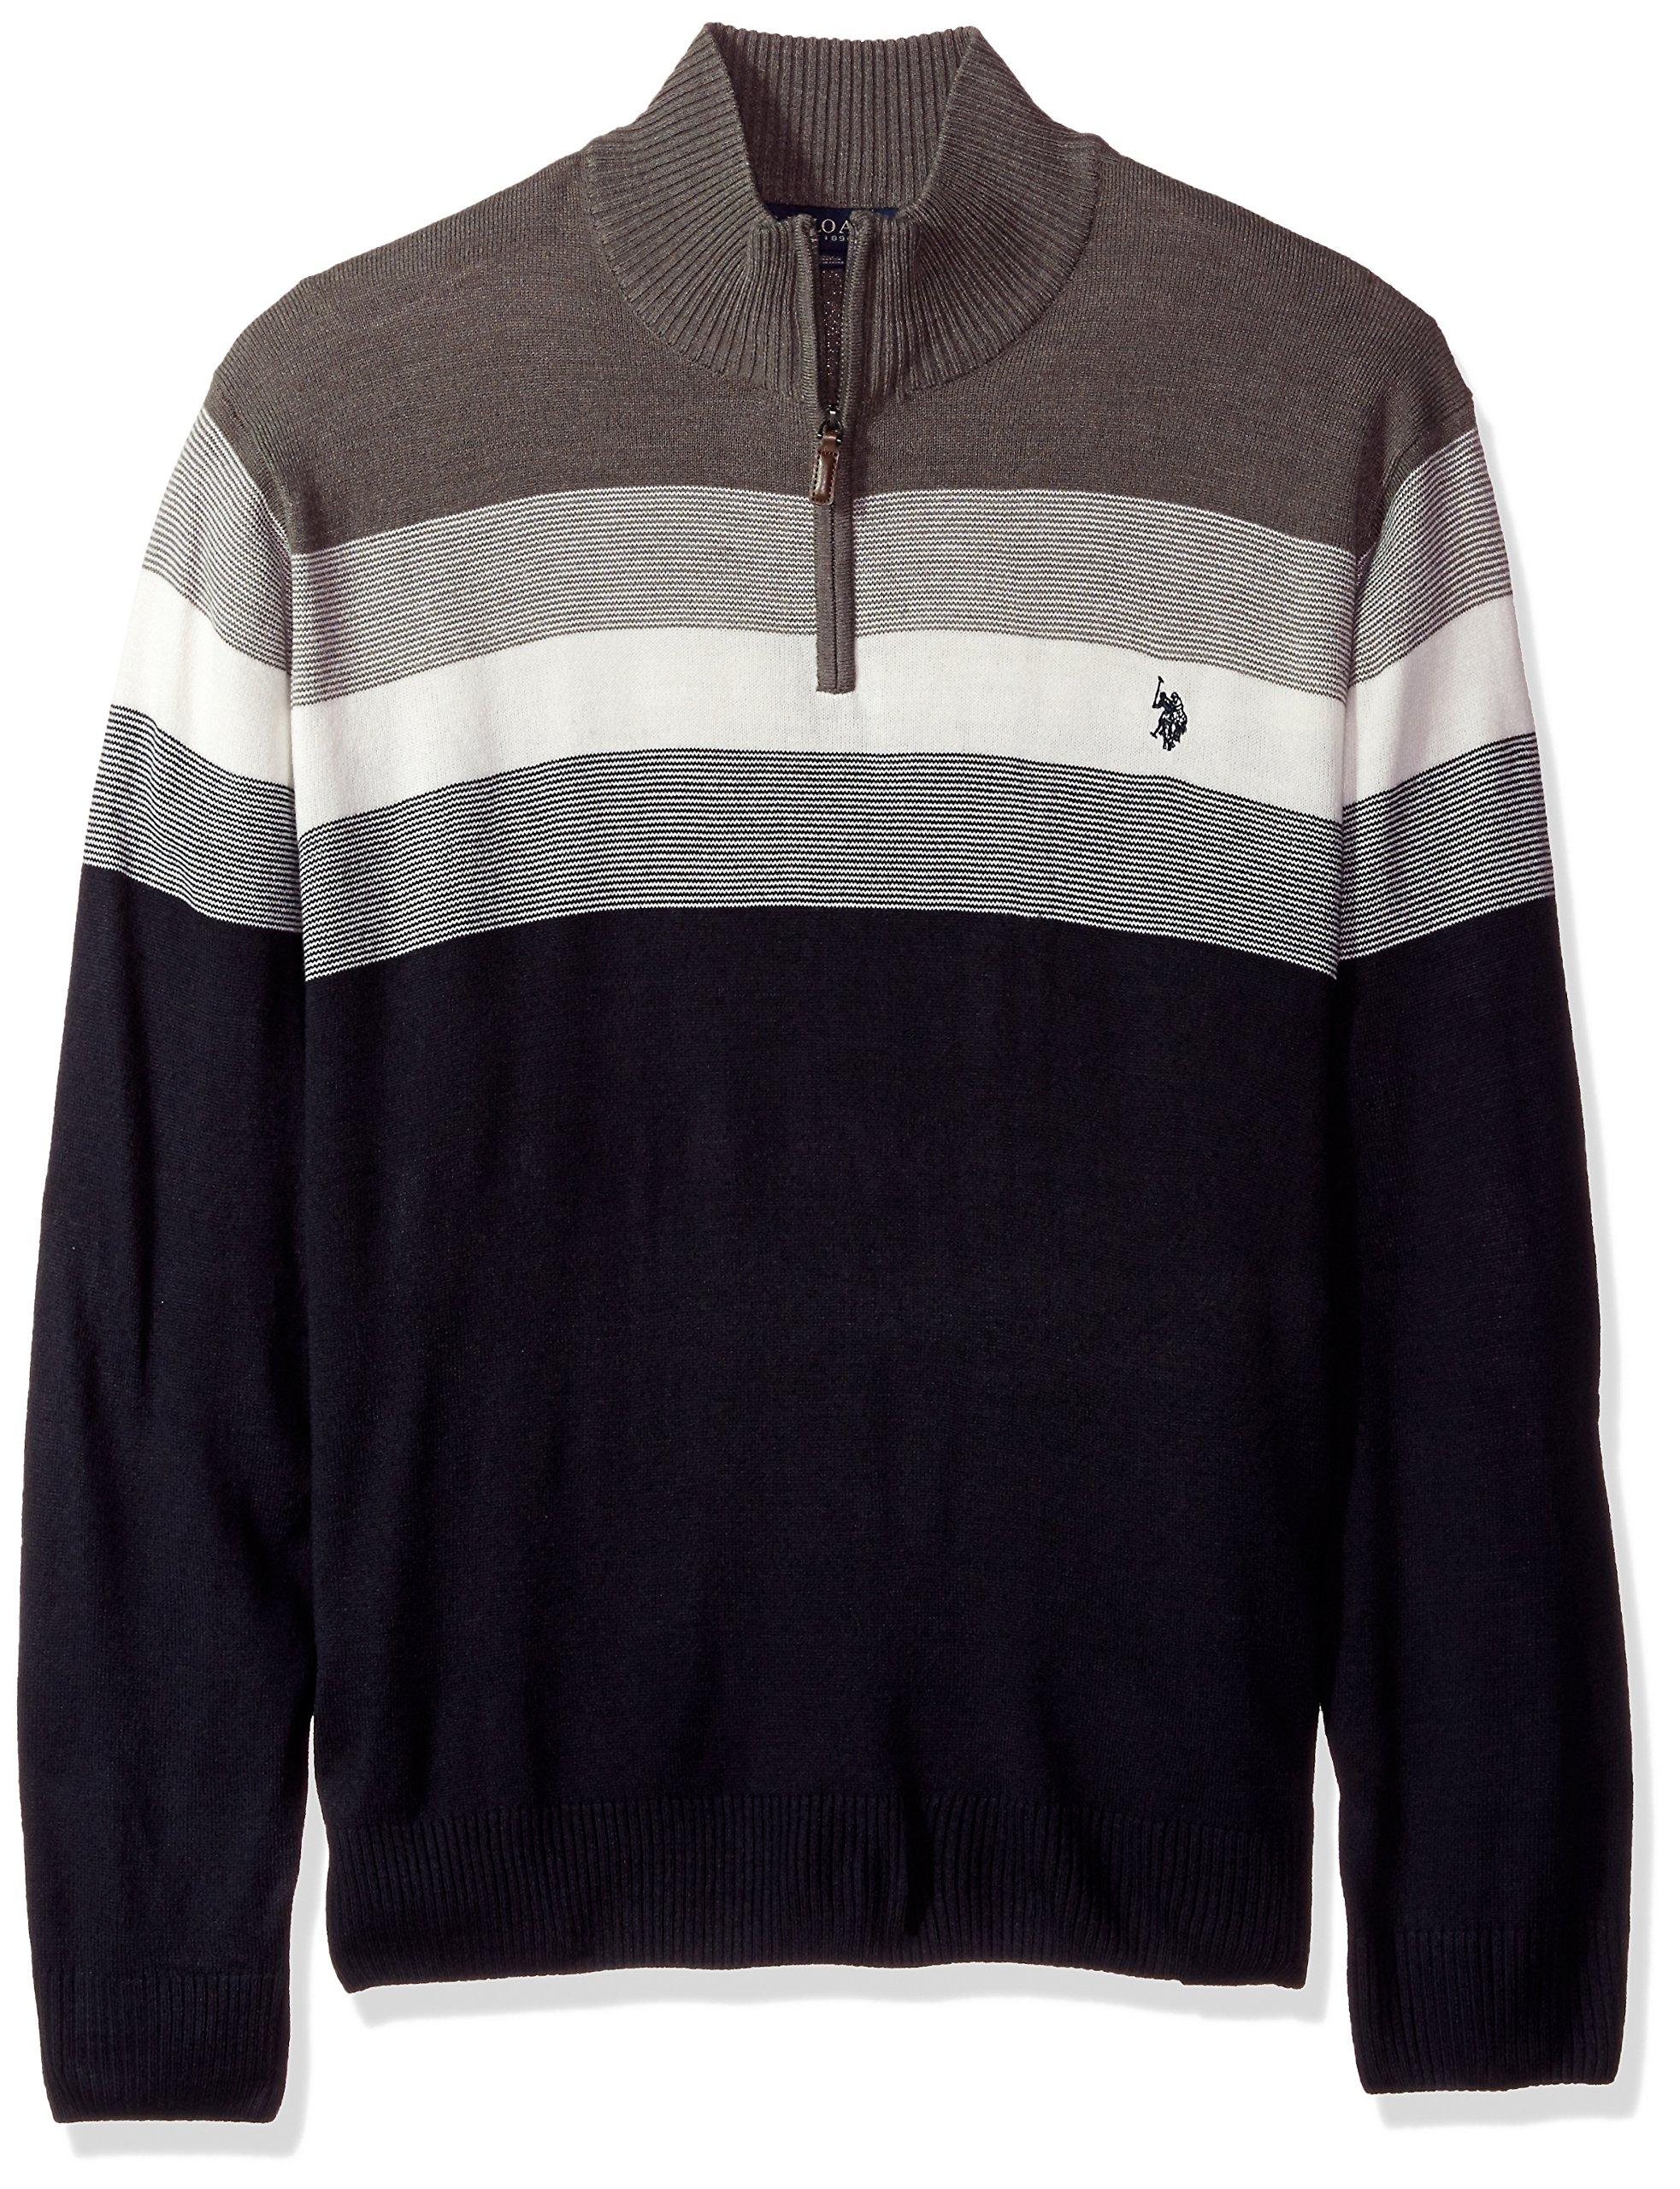 U.S. Polo Assn. Men's Tall Stripe Color Block V-Neck Sweater, Navy, 4X Big